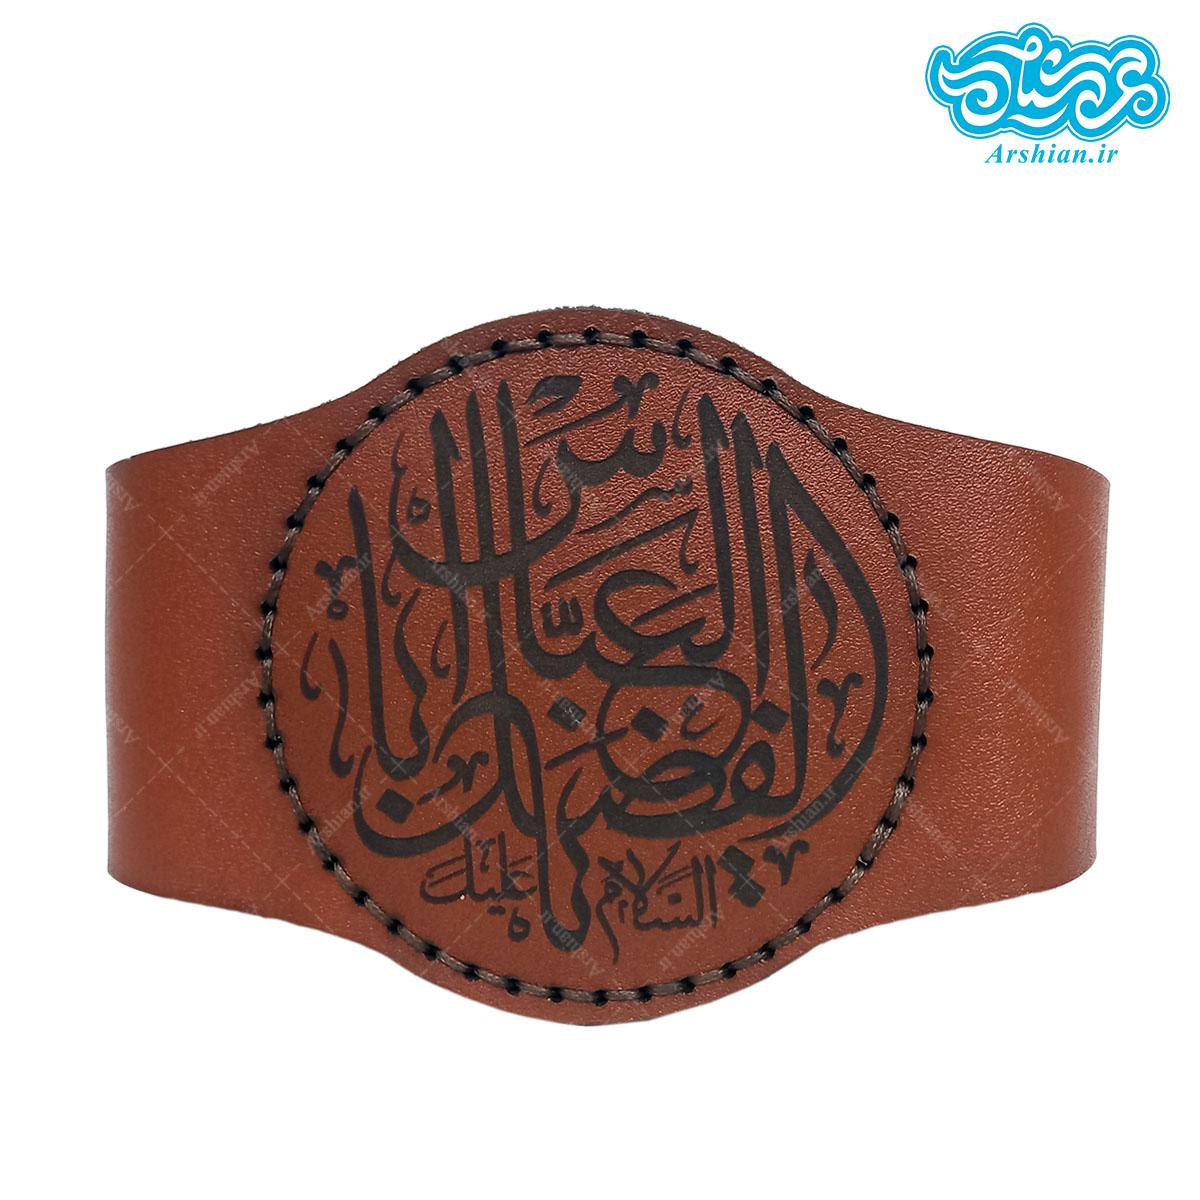 بازوبند چرم طرح یاابالفضل العباس کد003